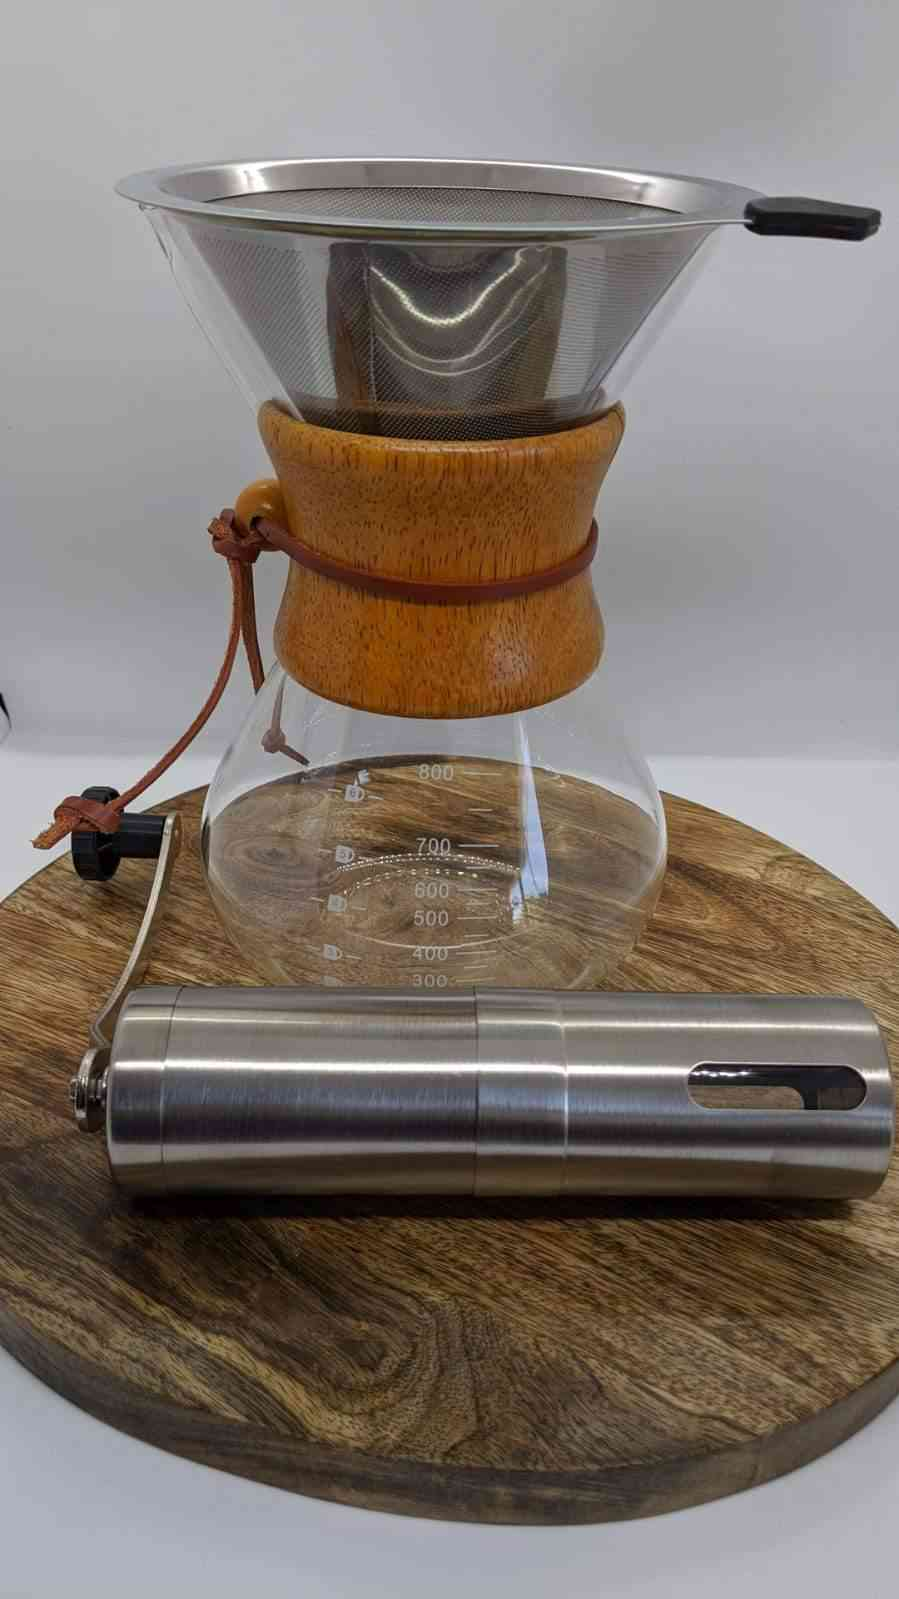 Stainless Steel Filter Handheld Coffee Grinder Pot